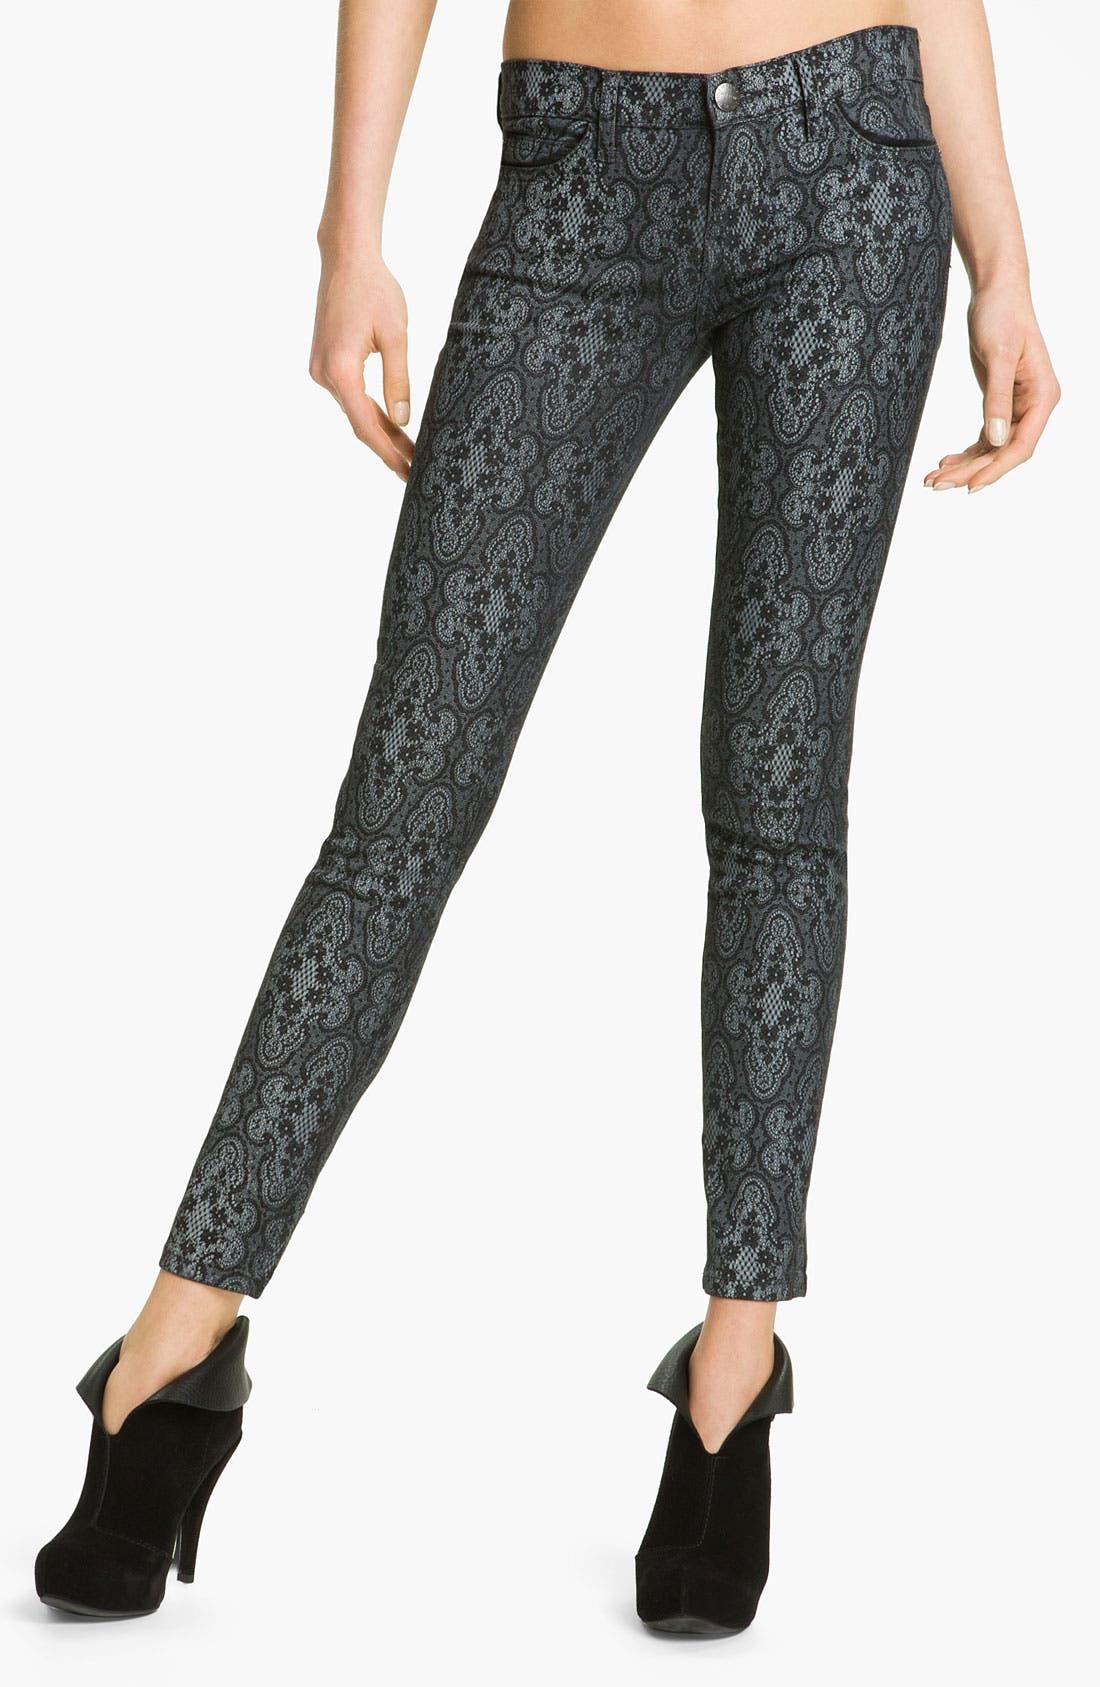 Alternate Image 1 Selected - Current/Elliott Print Stretch Skinny Jeans (Black Antique)